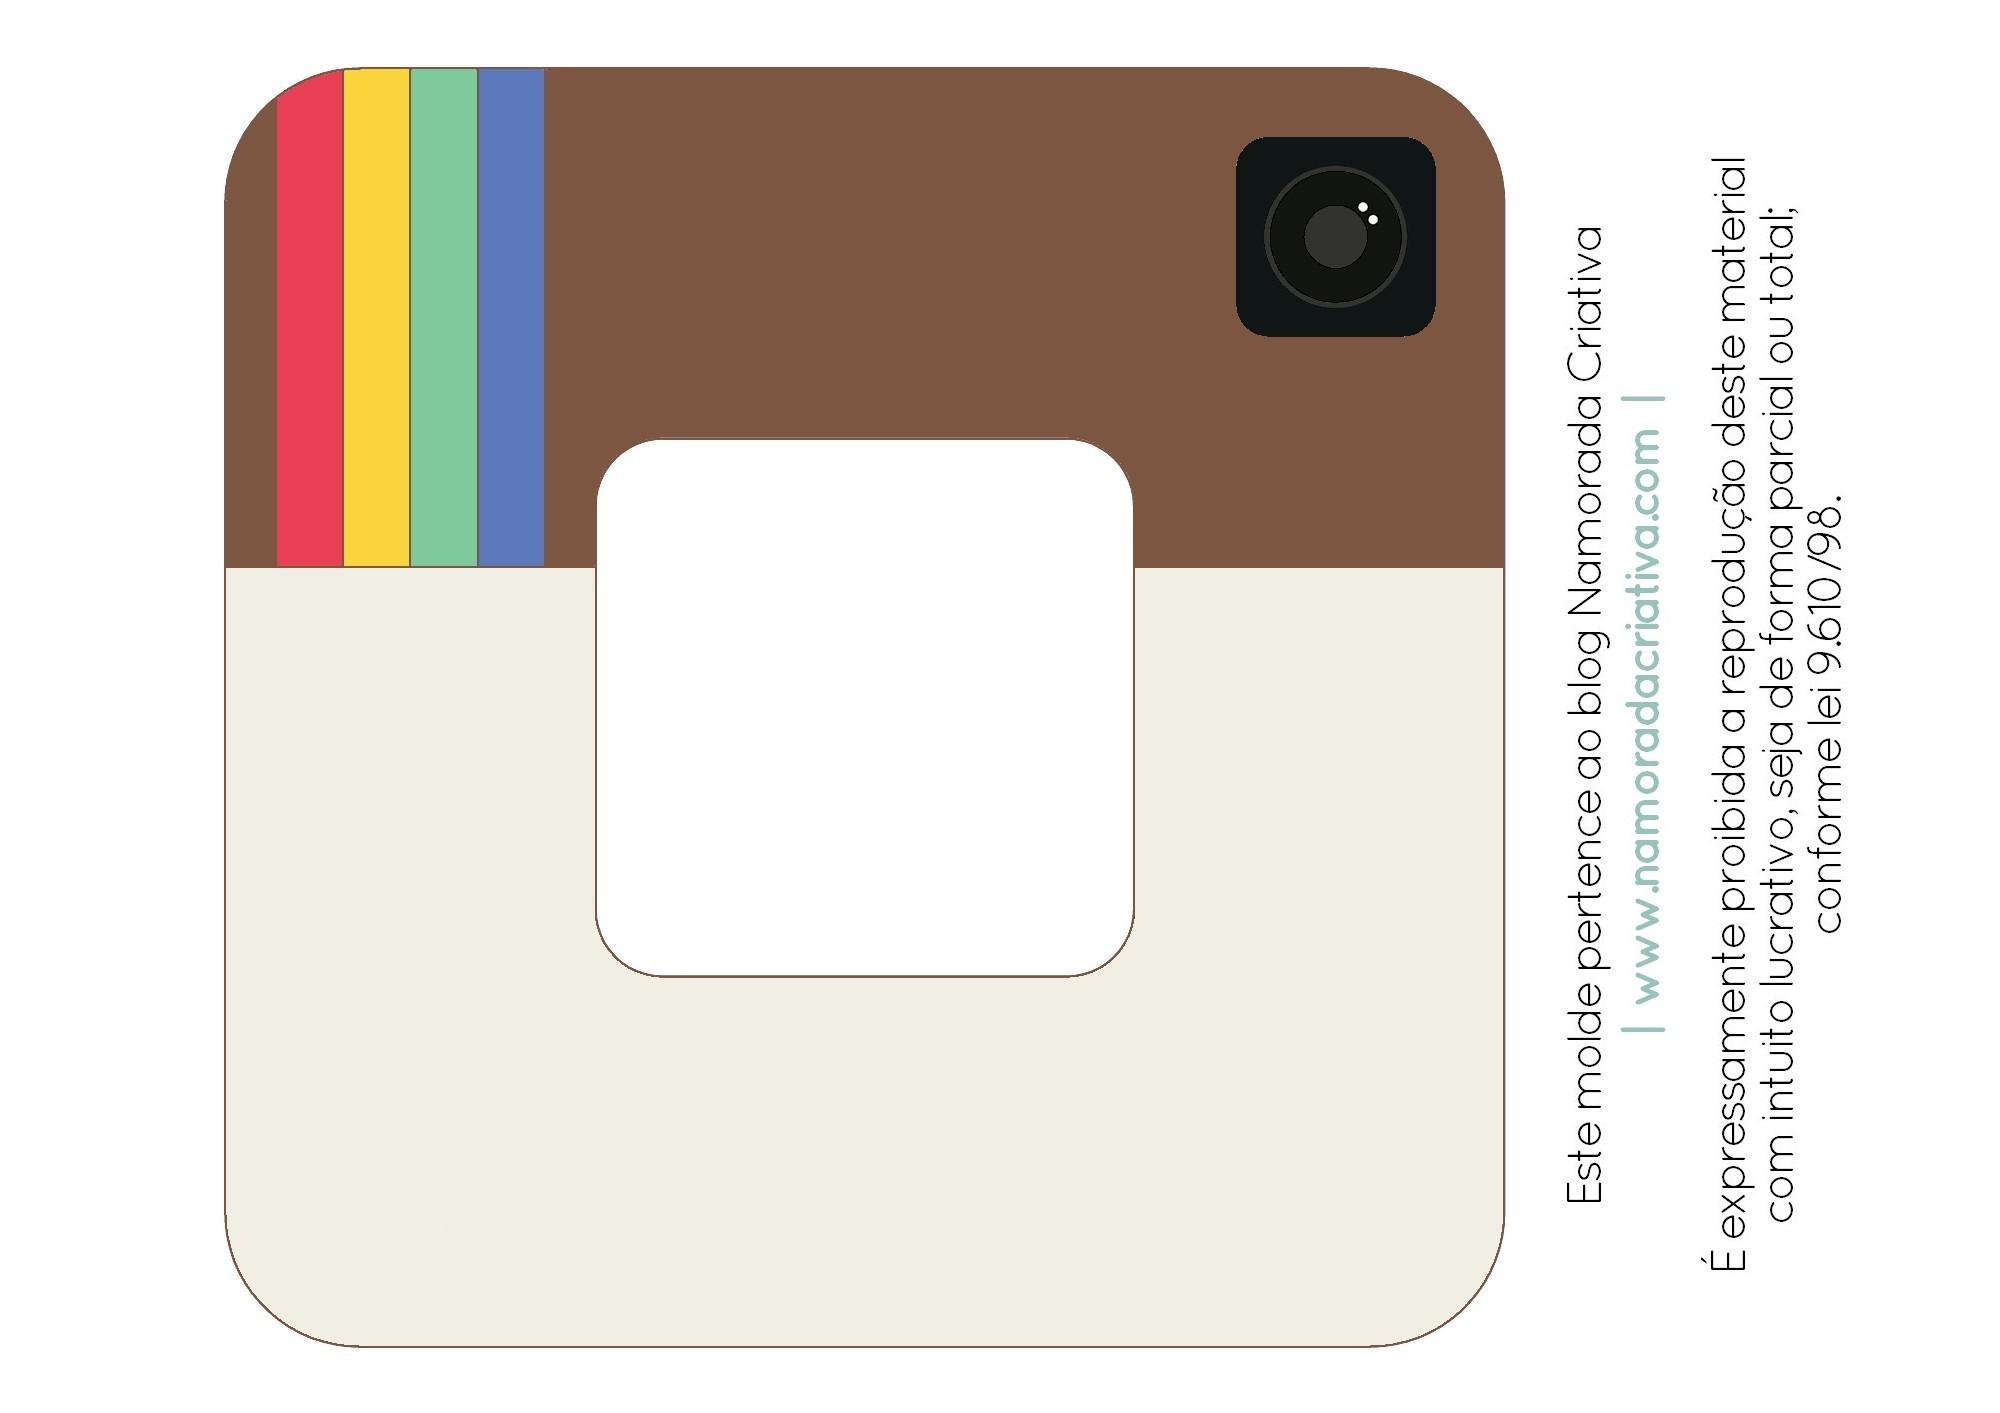 DIY-Porta-retrato-Instagram-Namorada-Criativa-Sem-texto